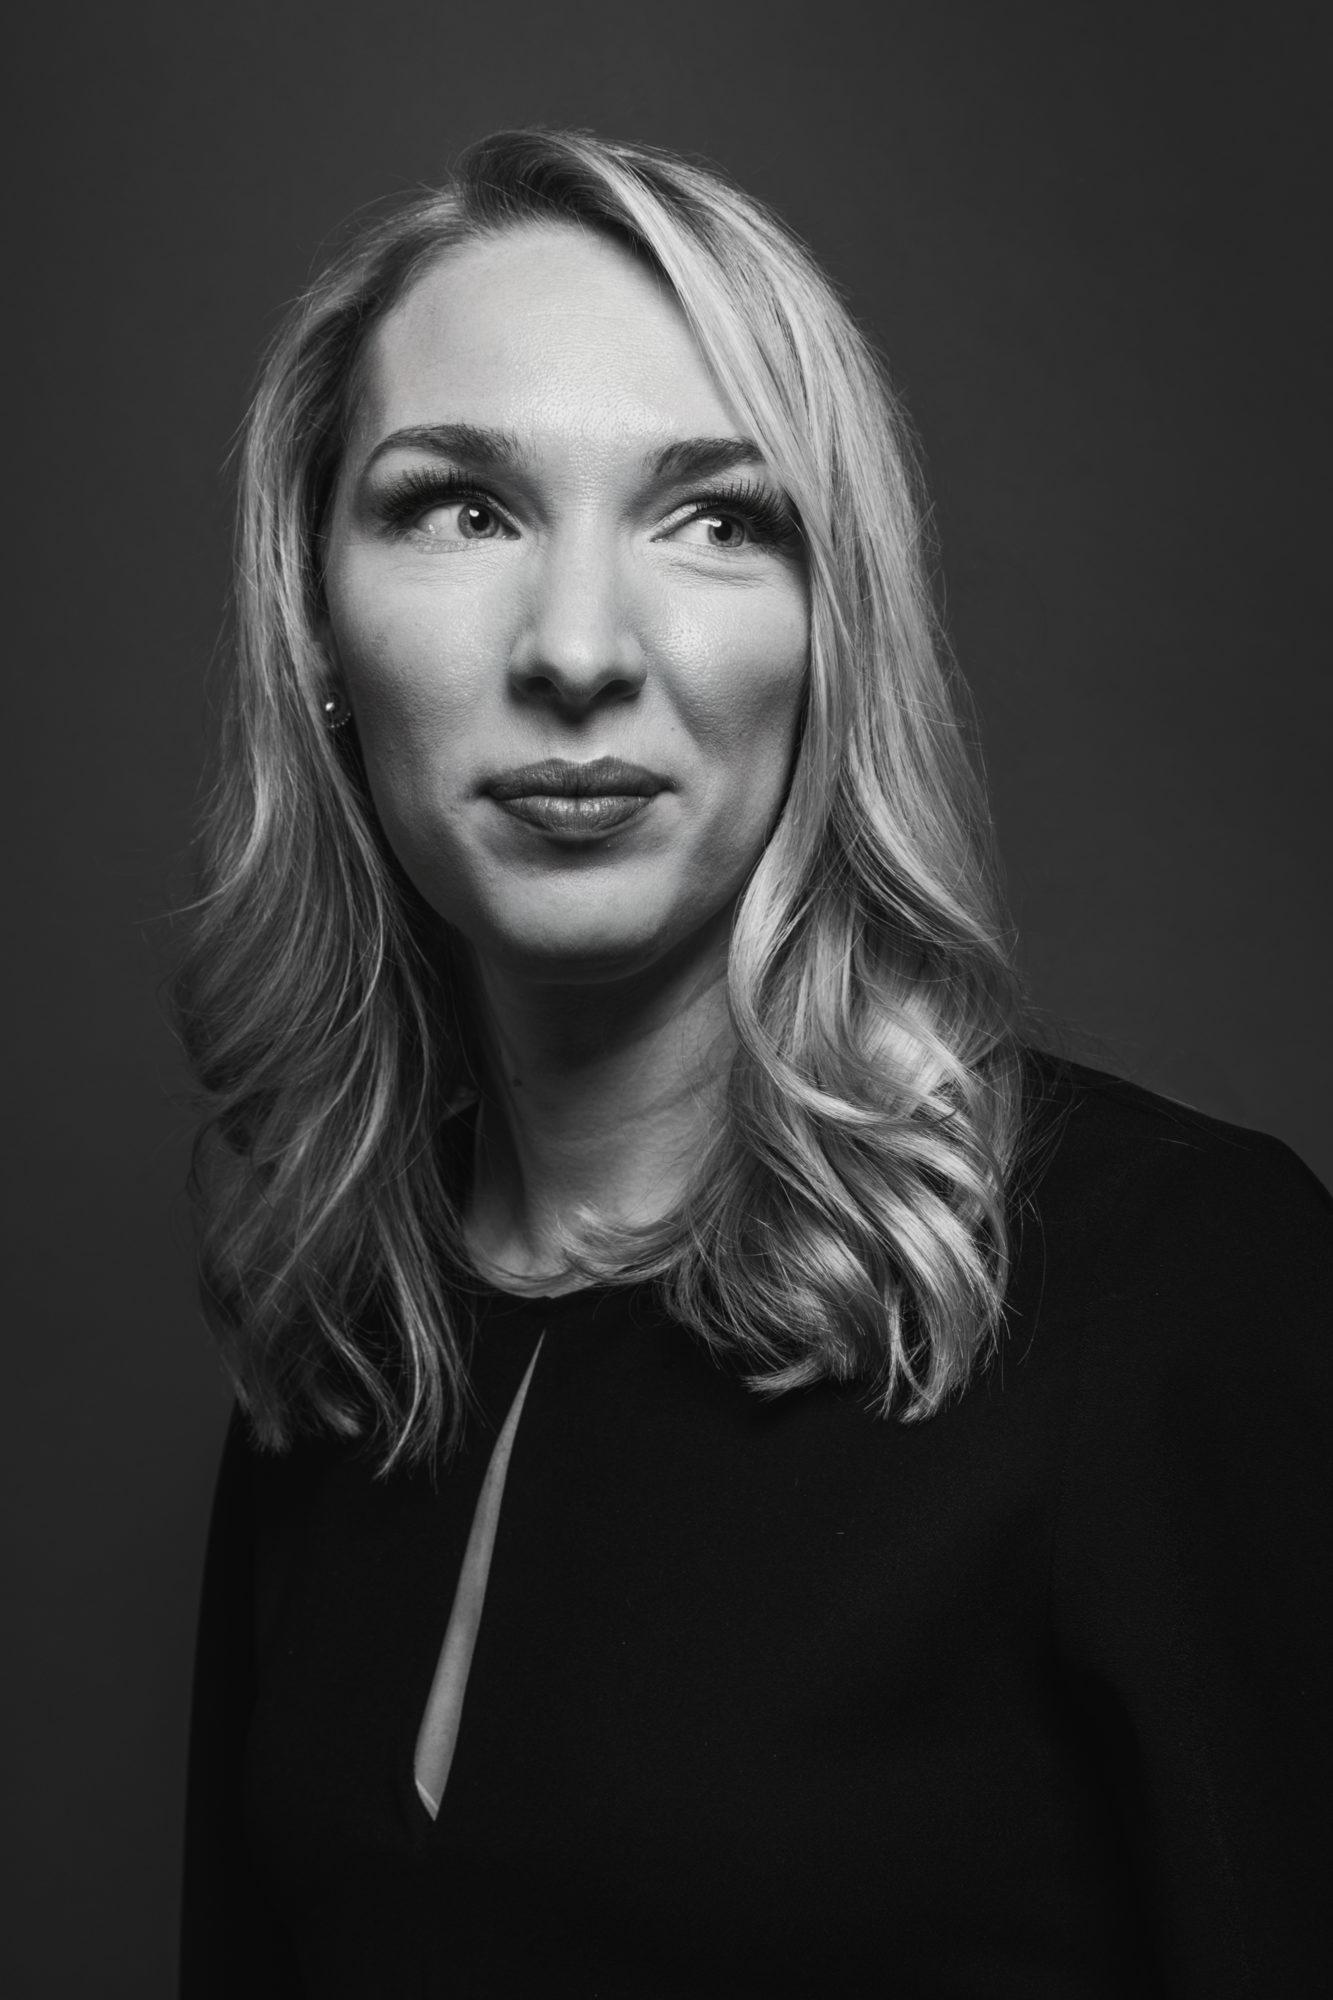 Beth J. Ranschau | 2021 40 Under 40